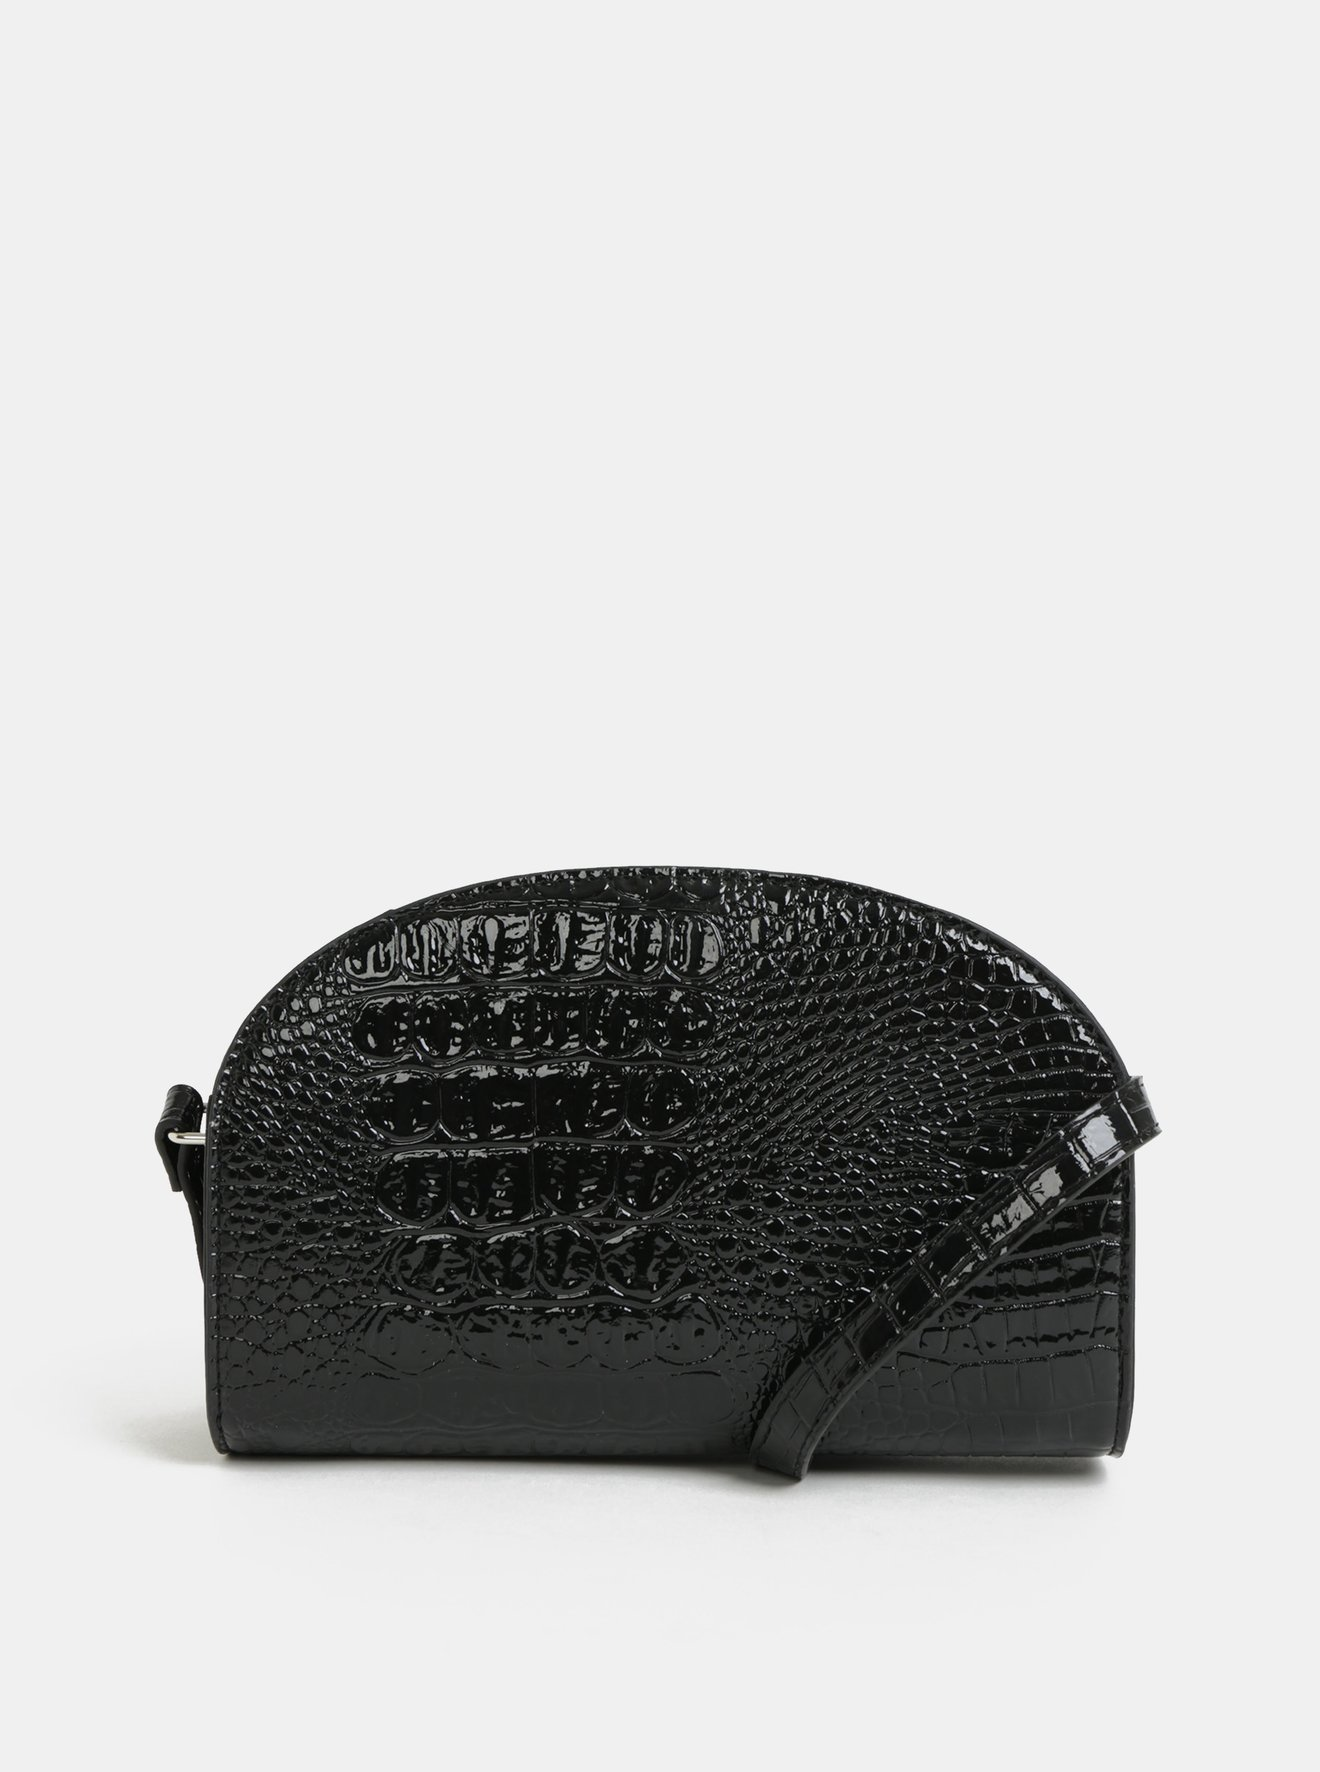 c9237ca600 Černá crossbody kabelka s hadím vzorem Pieces Fanny - SLEVA ...